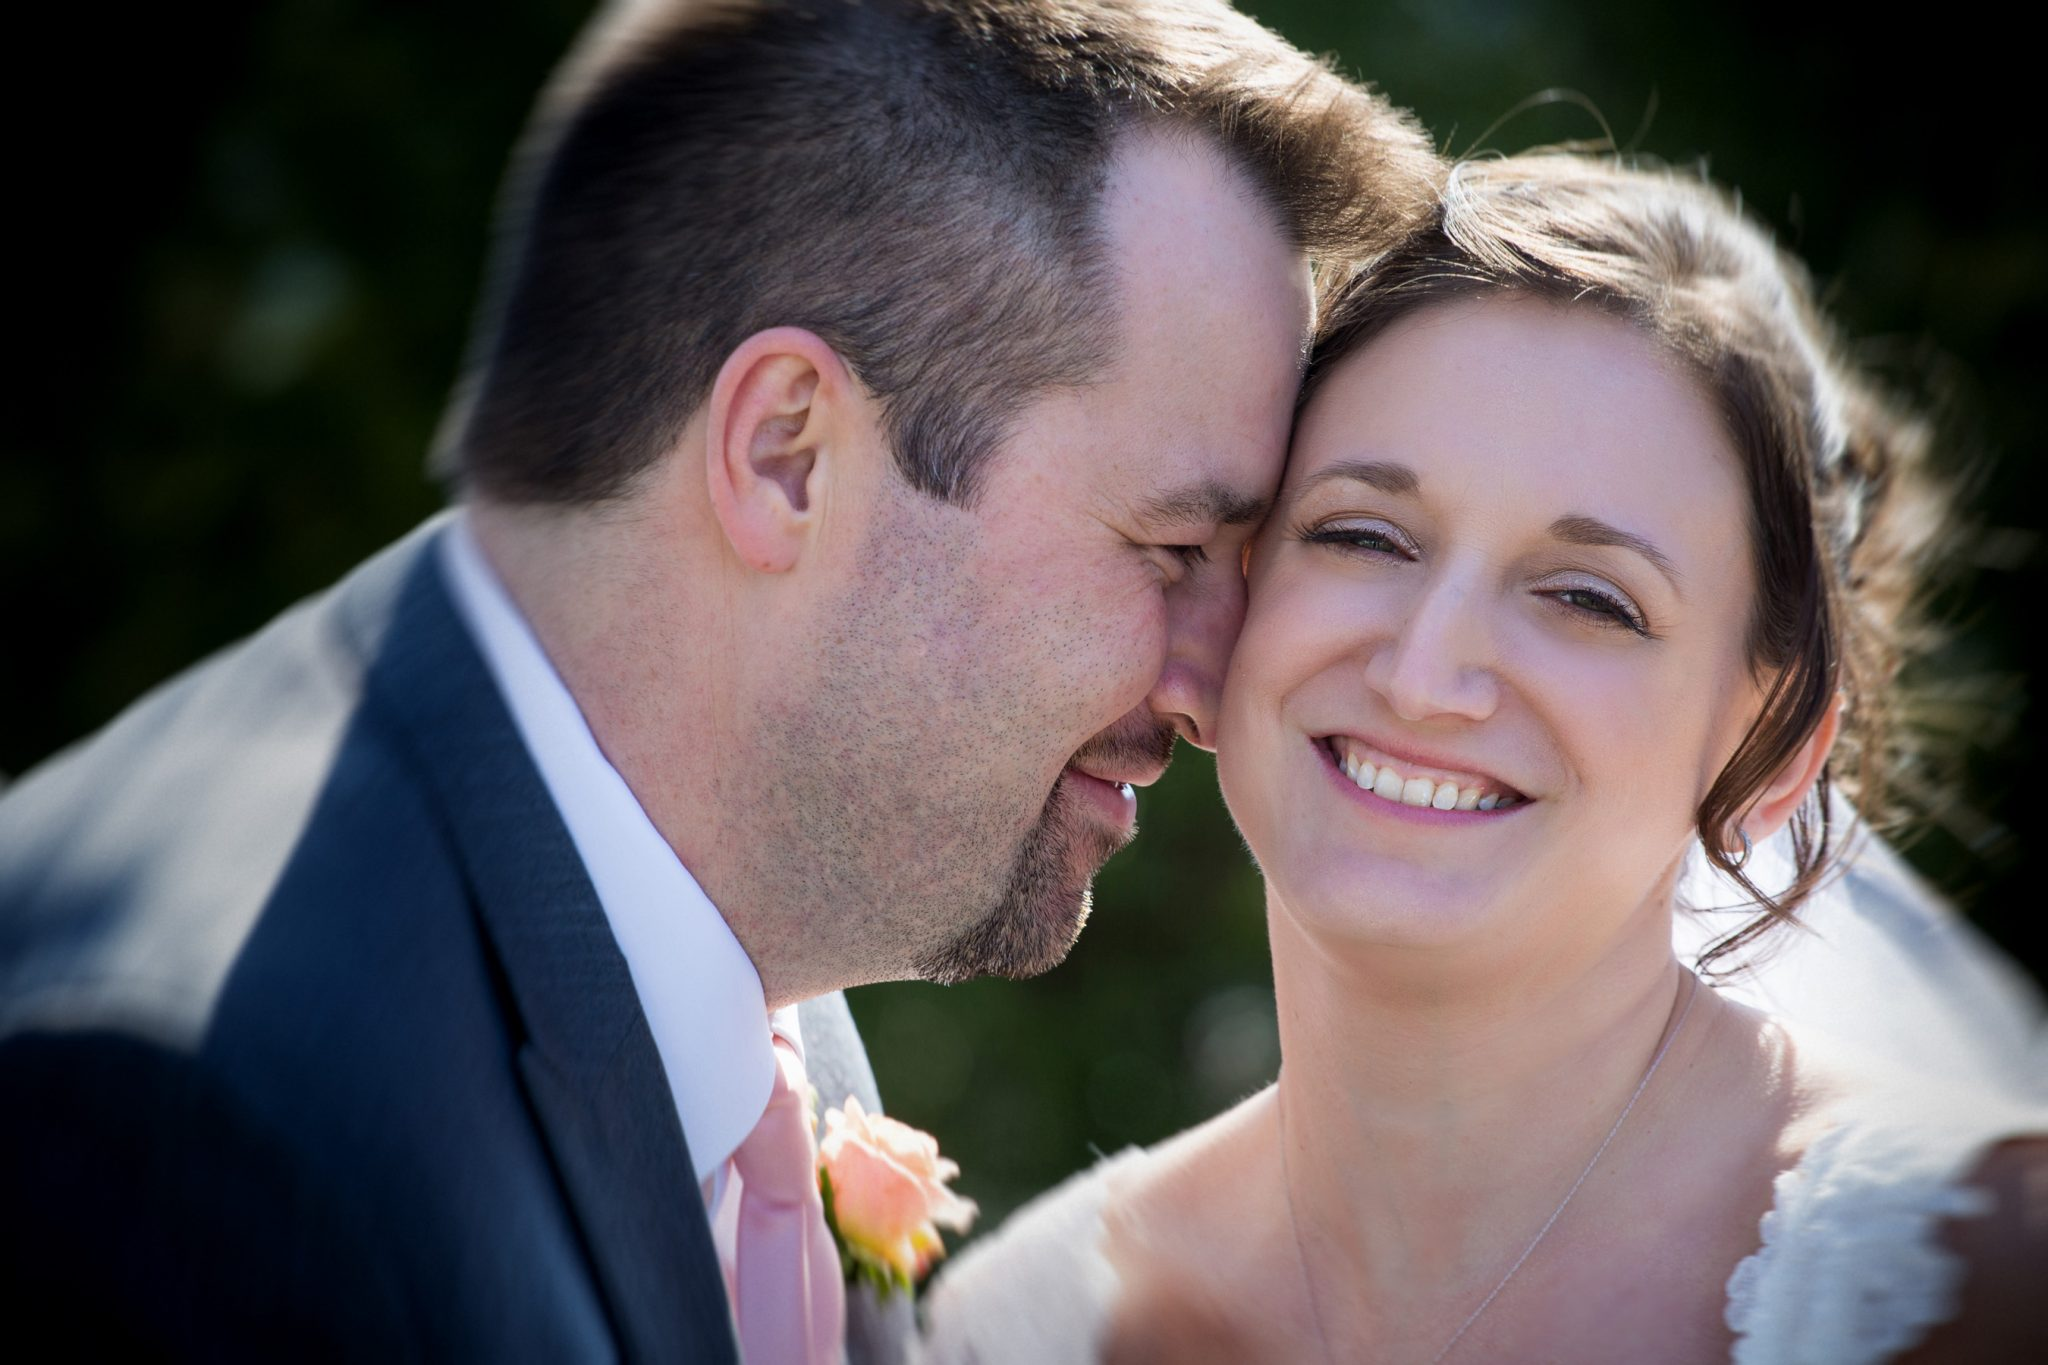 Samoset wedding photo of Bride and groom.